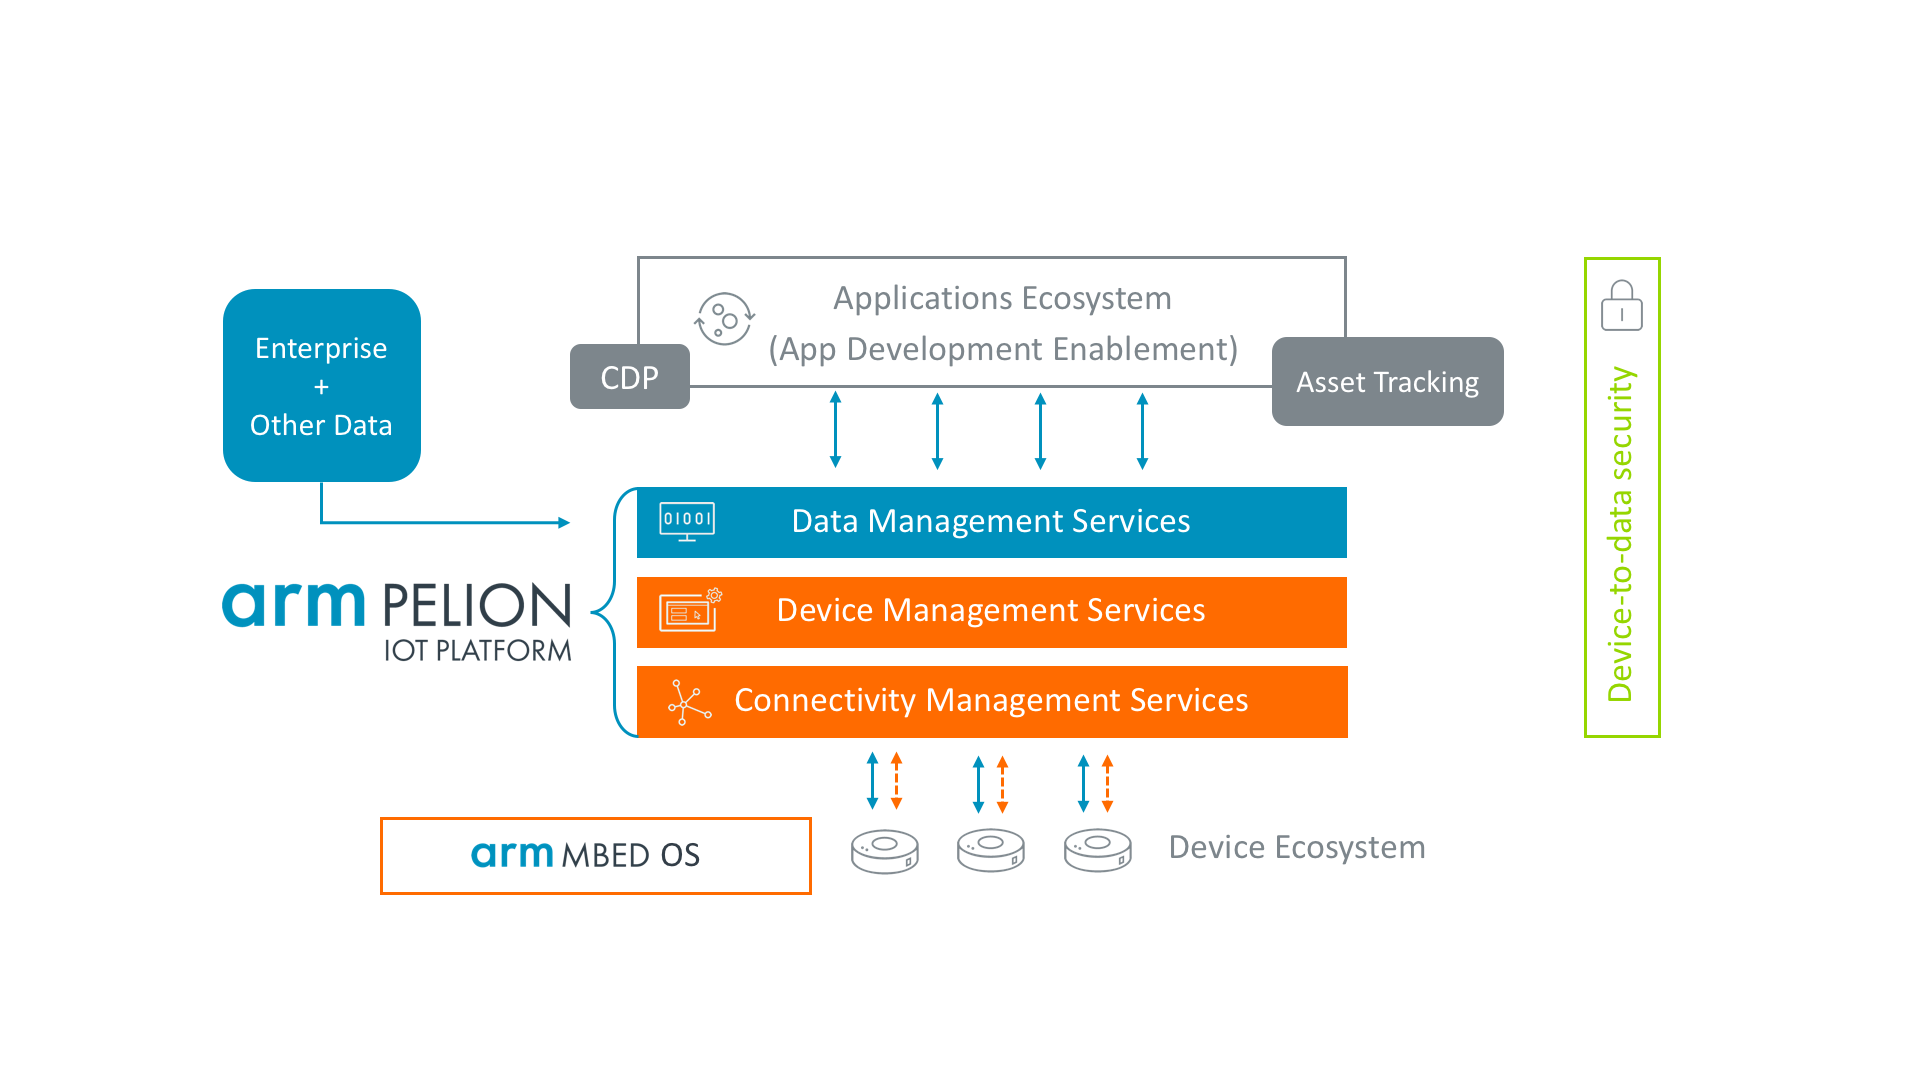 Sealing Treasure Data buy, Arm launches Pelion IoT Platform to